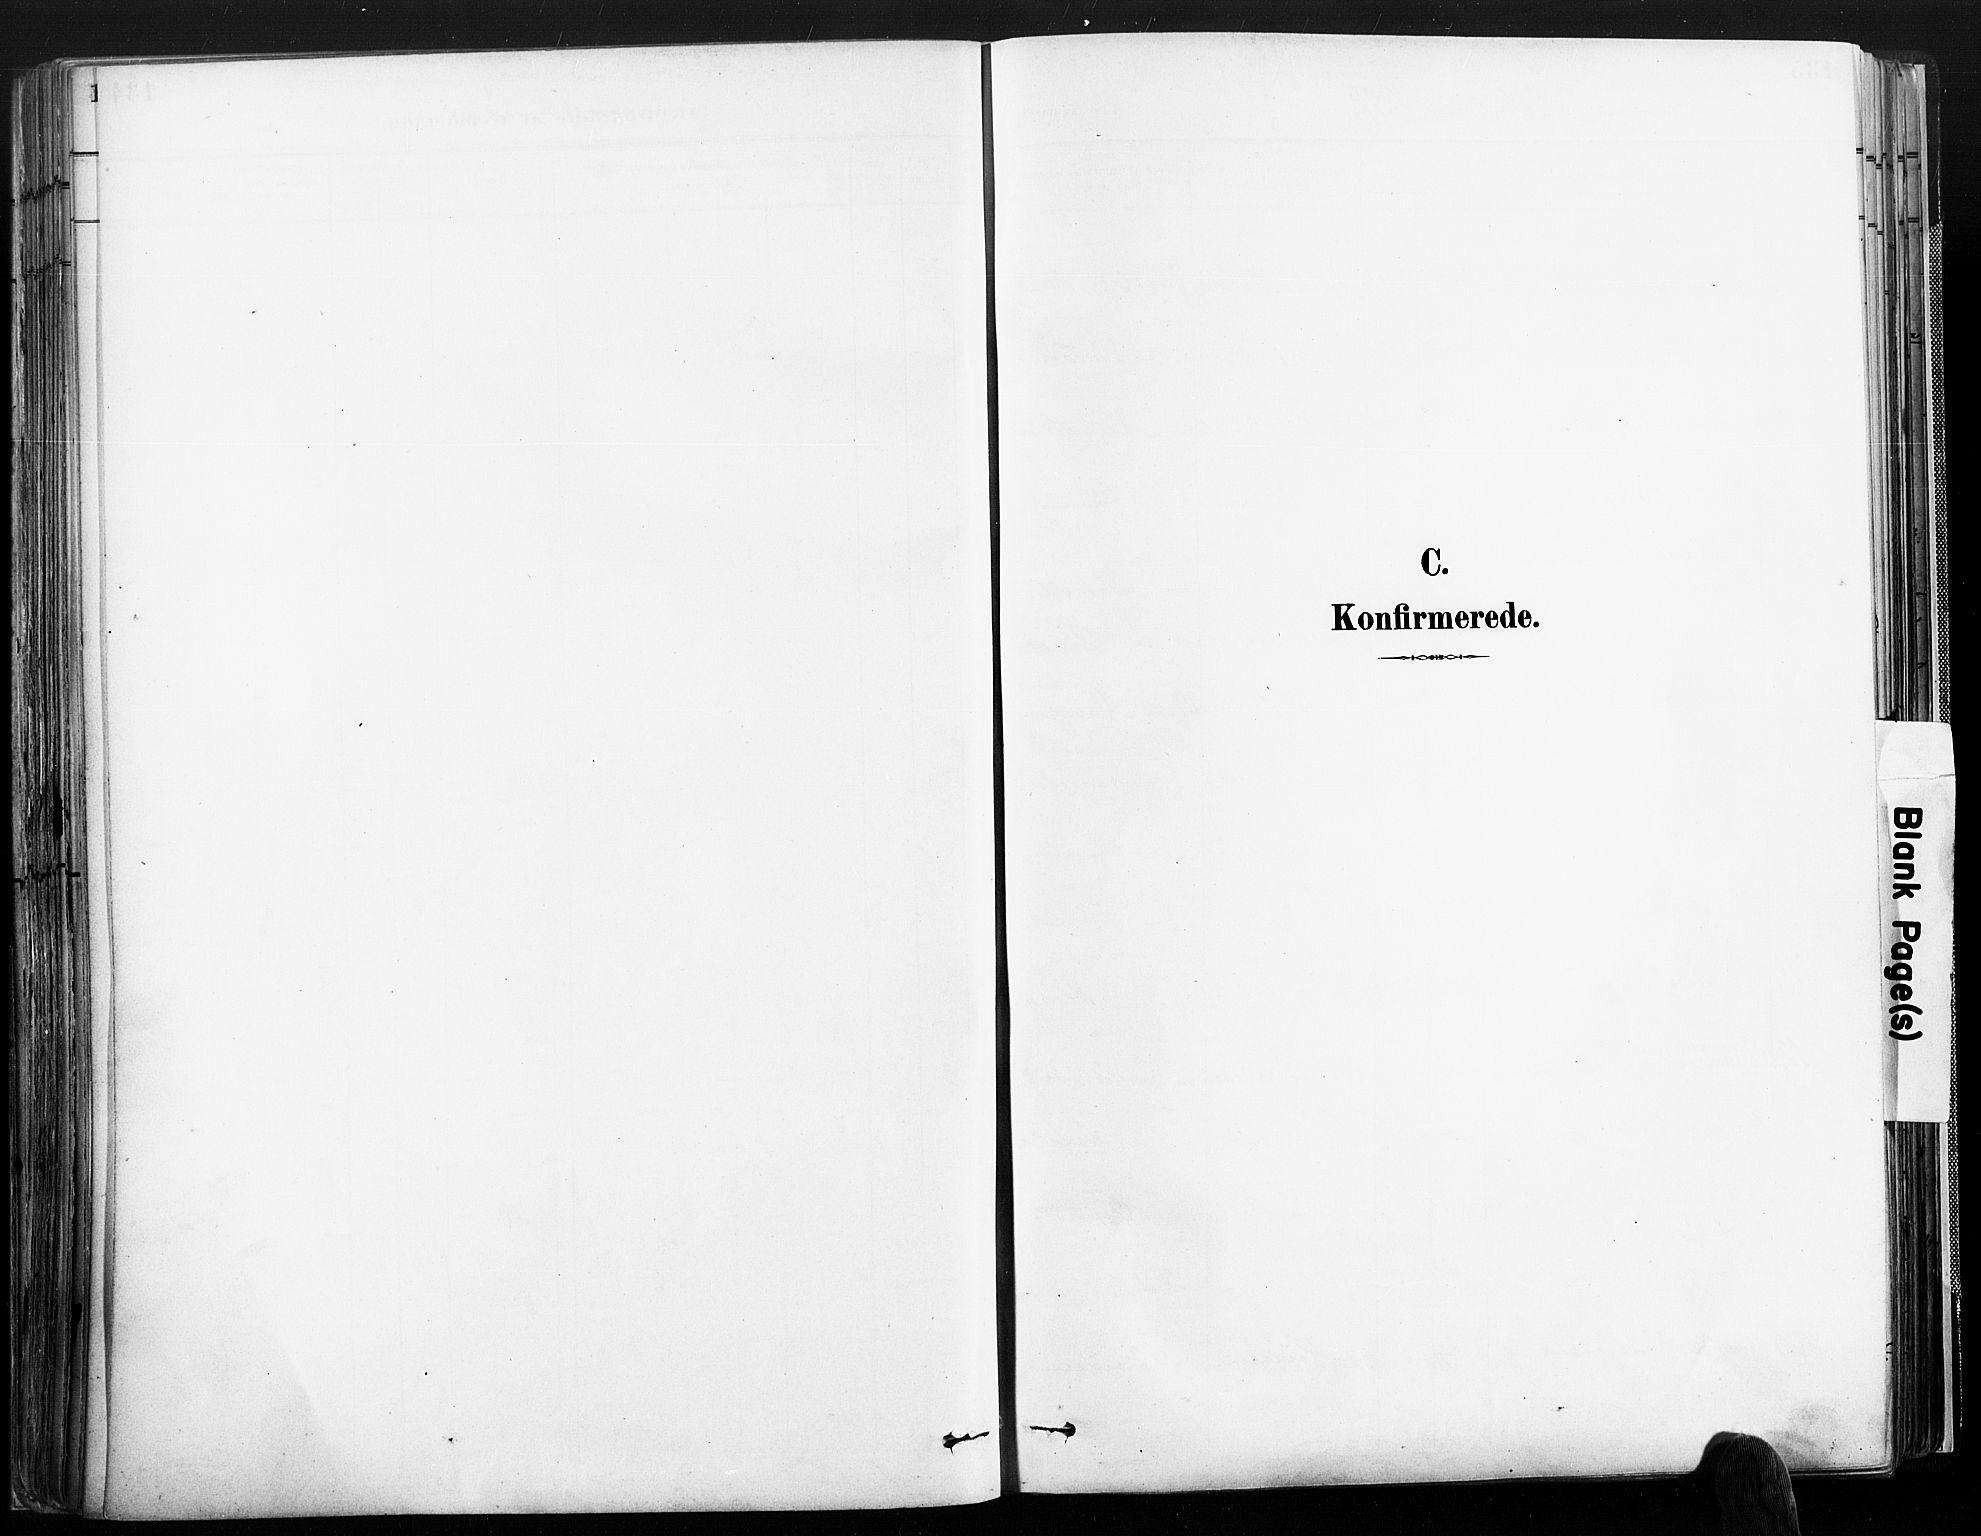 SAK, Øyestad sokneprestkontor, F/Fa/L0018: Ministerialbok nr. A 18, 1897-1907, s. 134